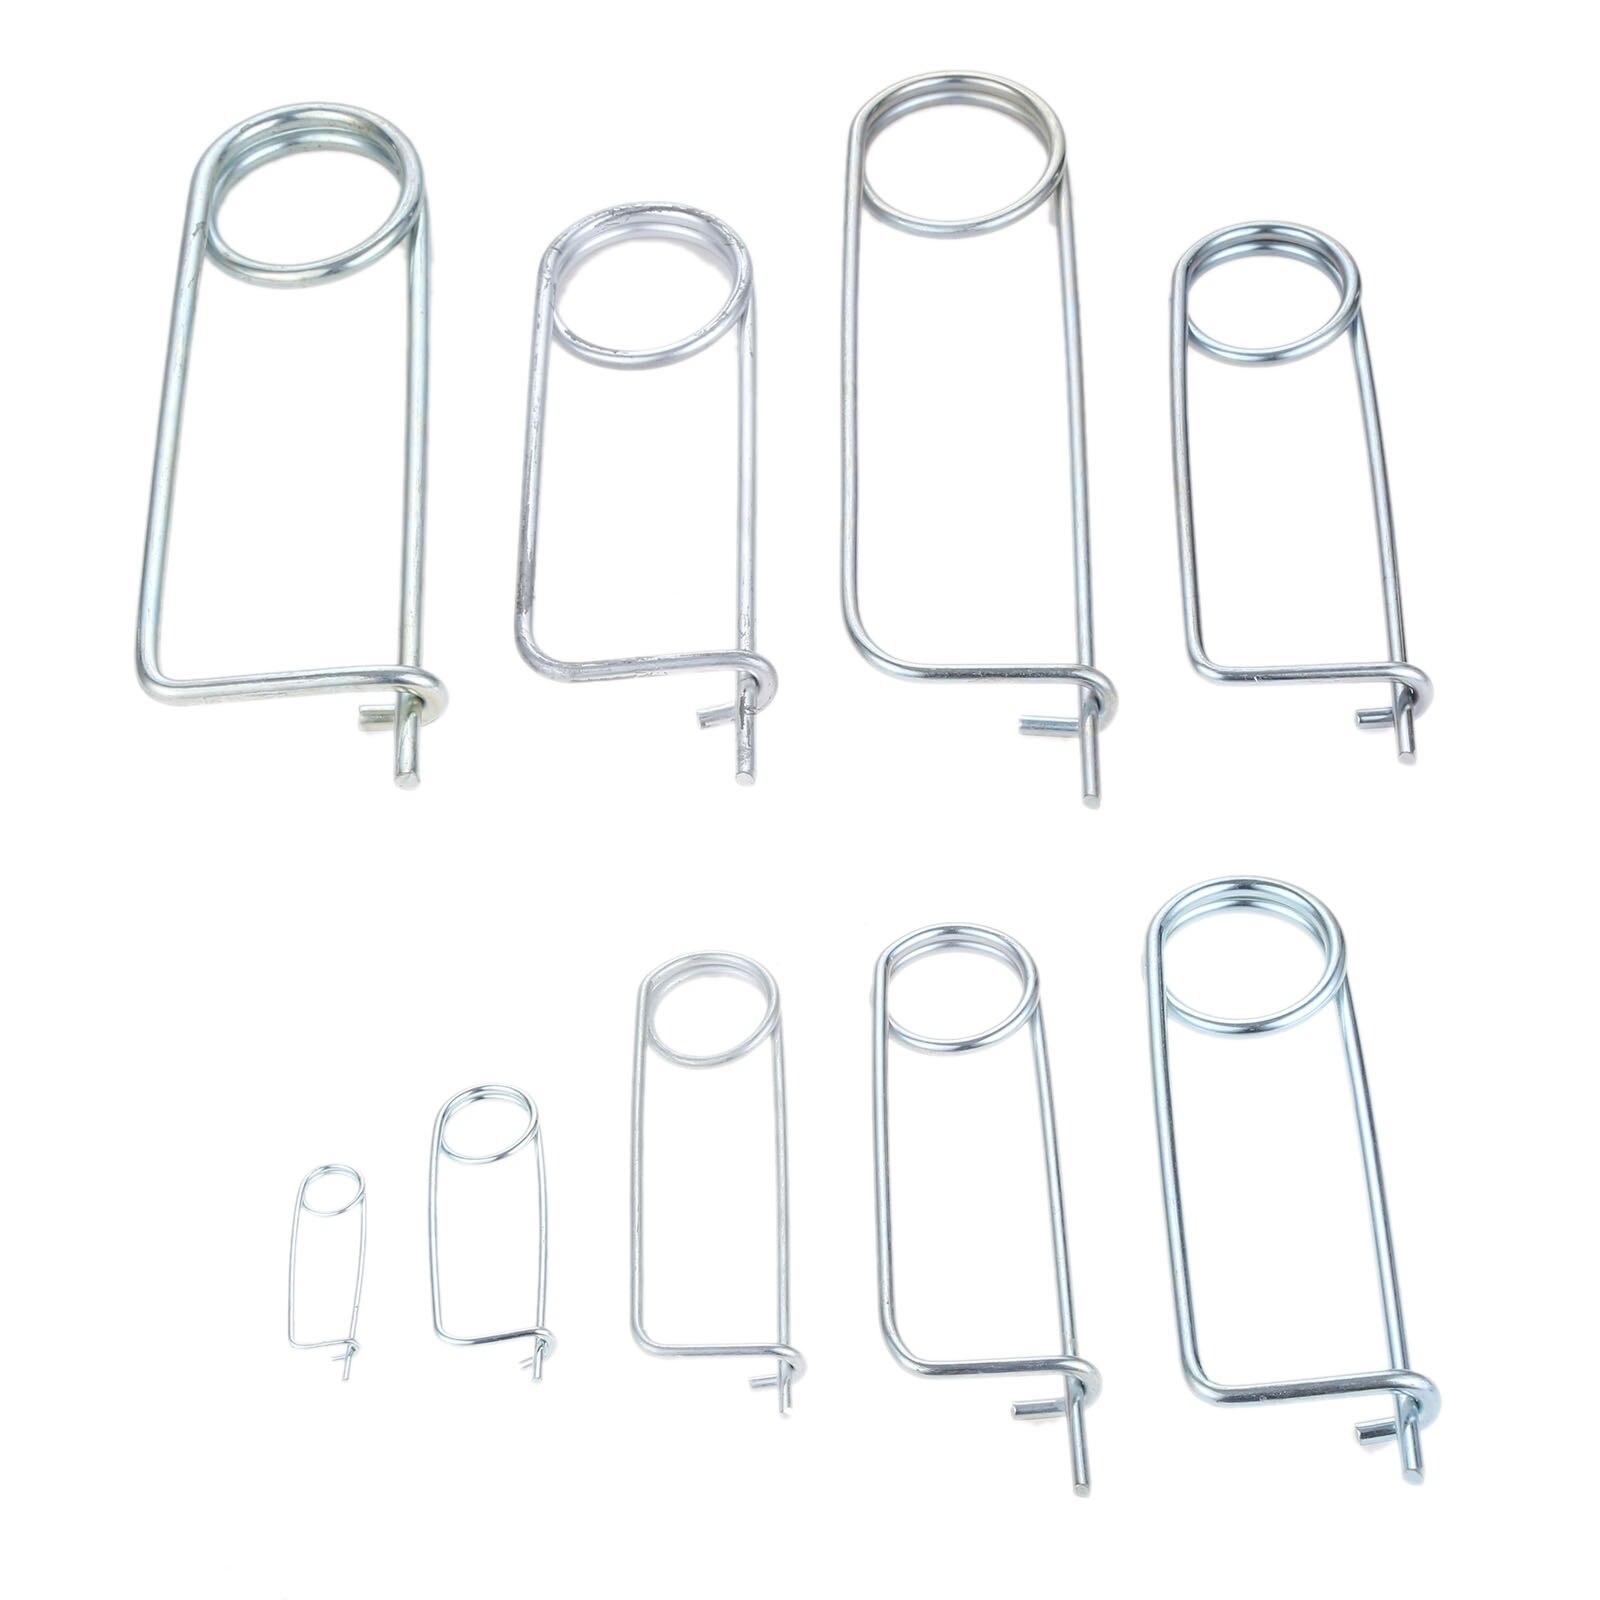 DRELD 10/5/1pcs Steel Brooch Shape Cotter Safety Pins Spring Pin Quick Lock Brooch Locking Fastener For Farm Lawn Garden Hitch